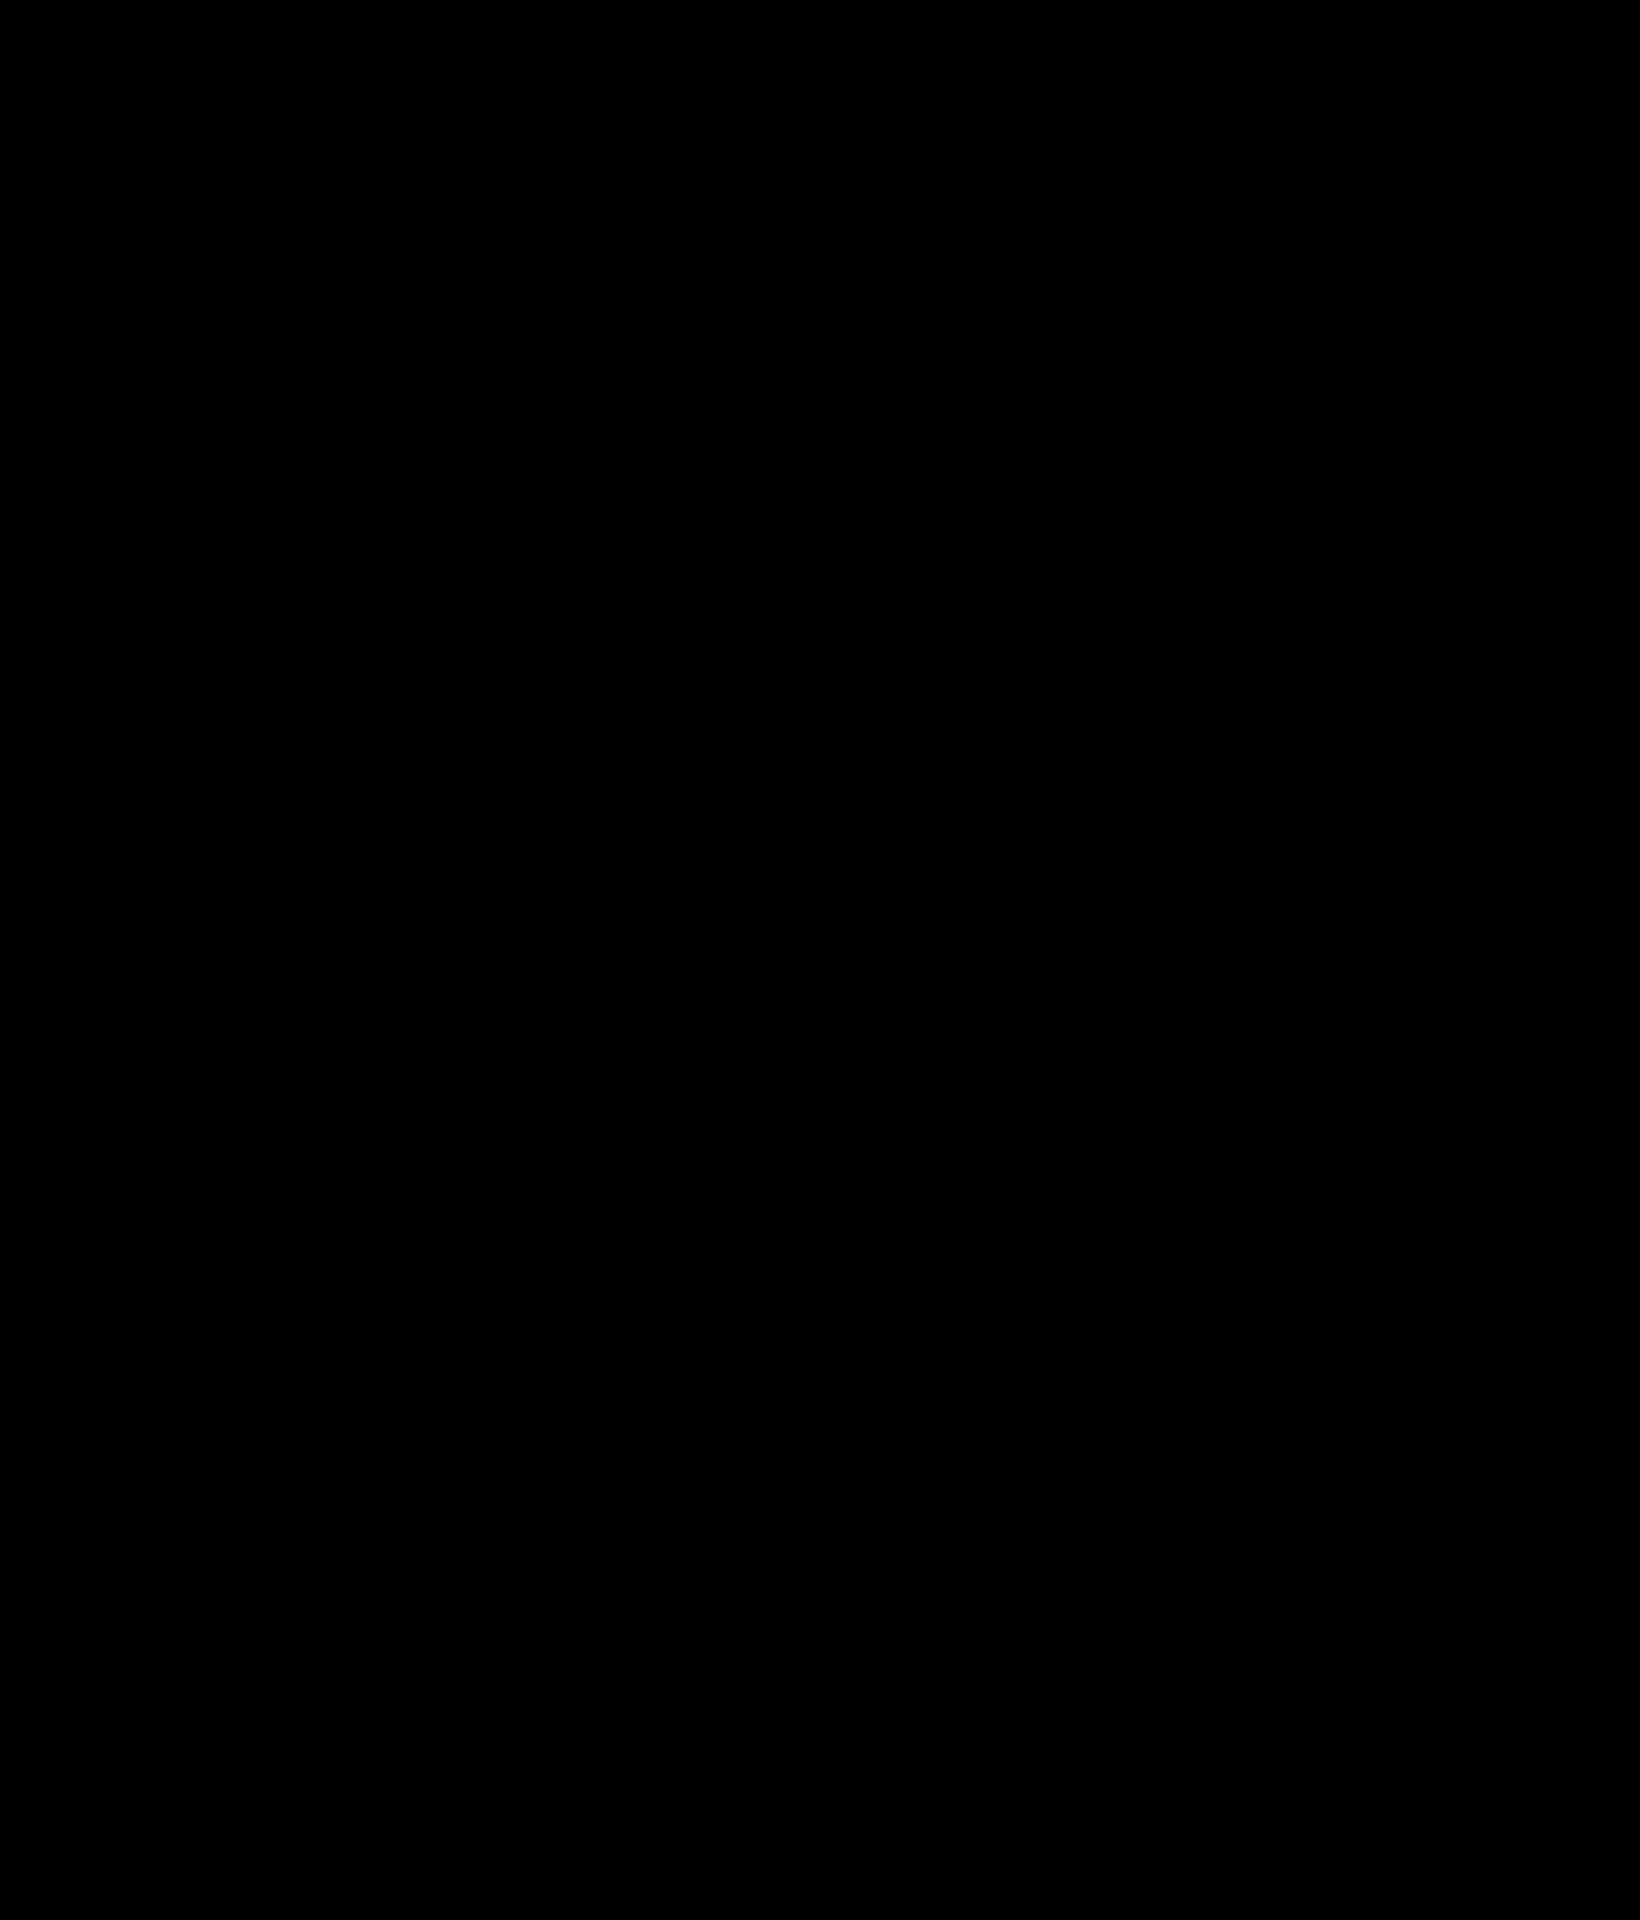 cube with binary code - Binary Code PNG